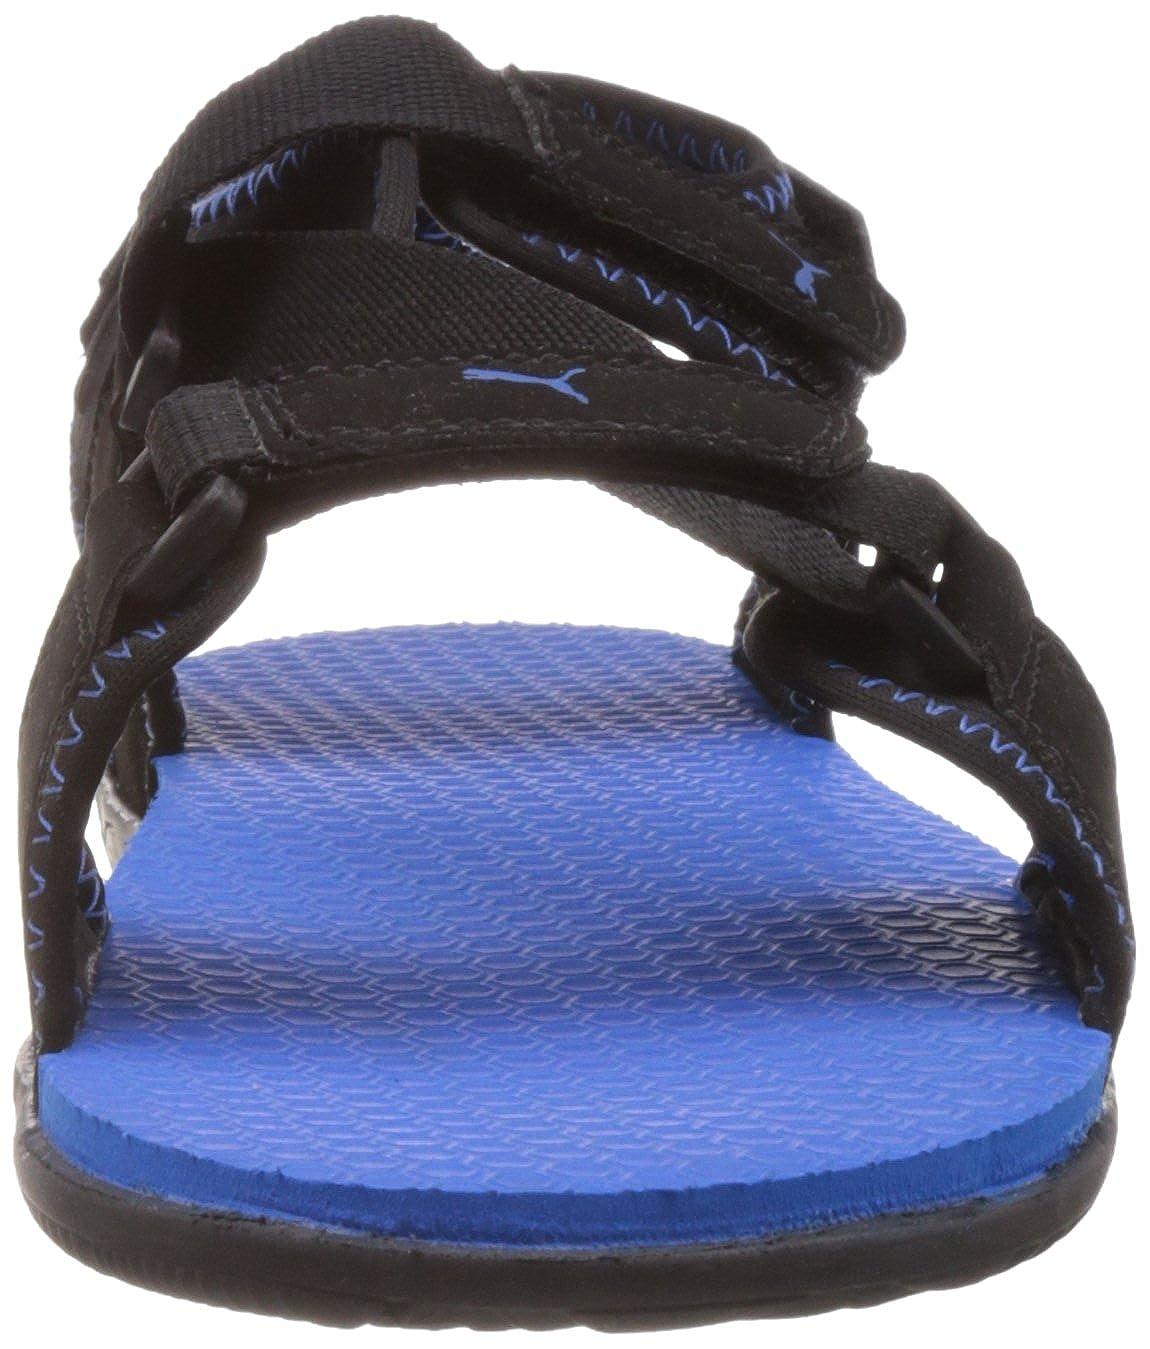 5df40198bae Puma Men s Woody DP Black-Brilliant Blue Athletic   Outdoor Sandals - 11 UK  India(46EU)  Buy Online at Low Prices in India - Amazon.in